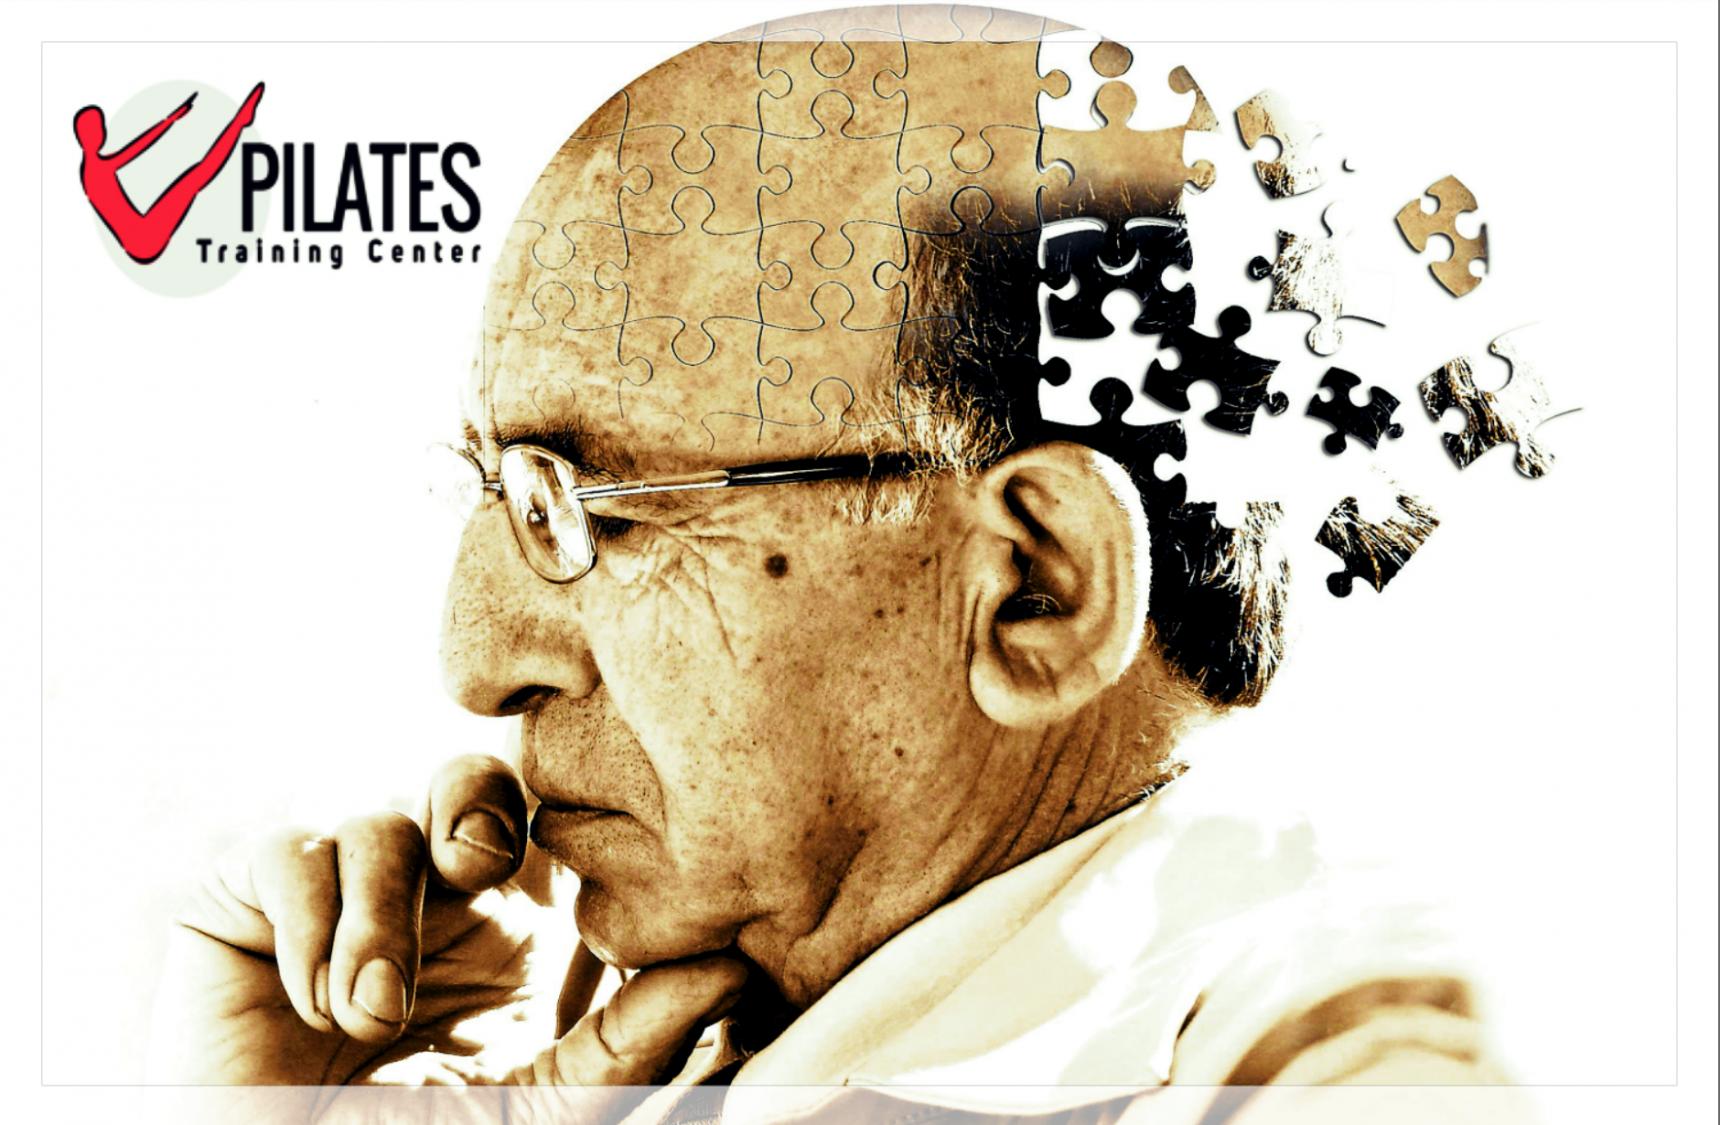 El Alzheimer y el Pilates